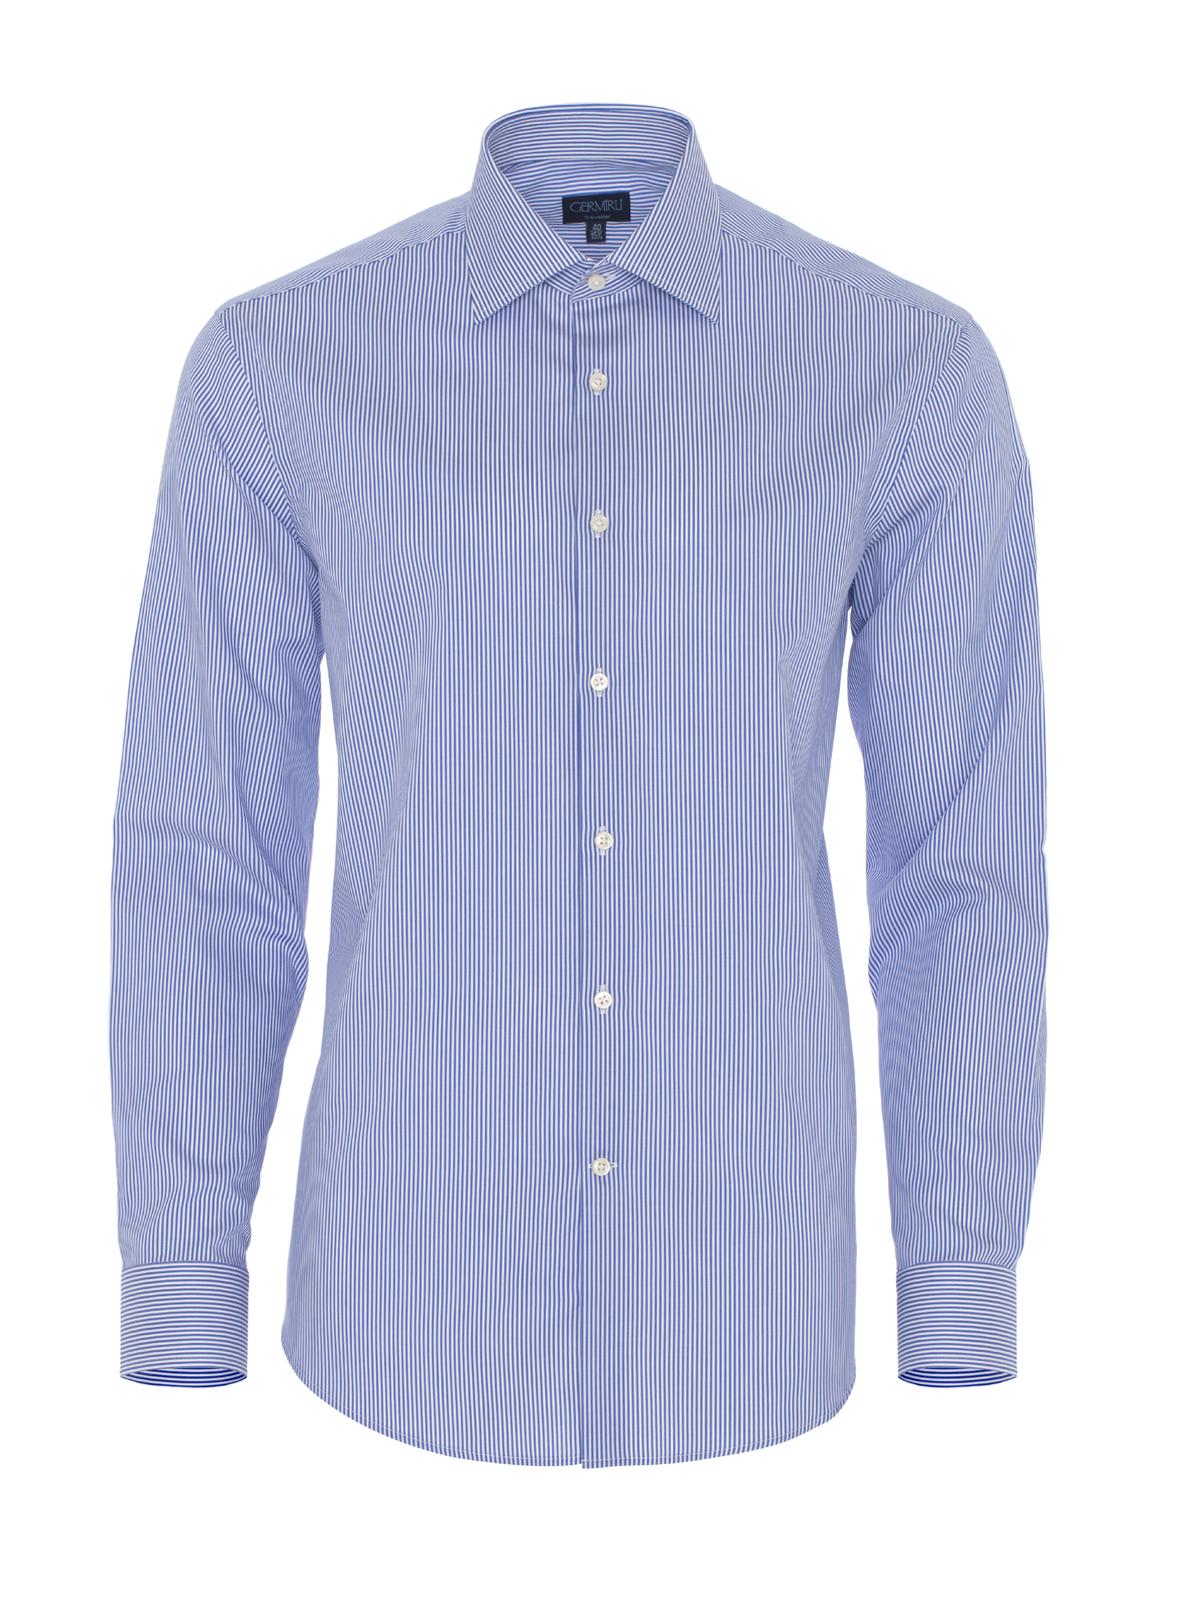 Germirli Non Iron K.Mavi Çizgili Tailor Fit Gömlek